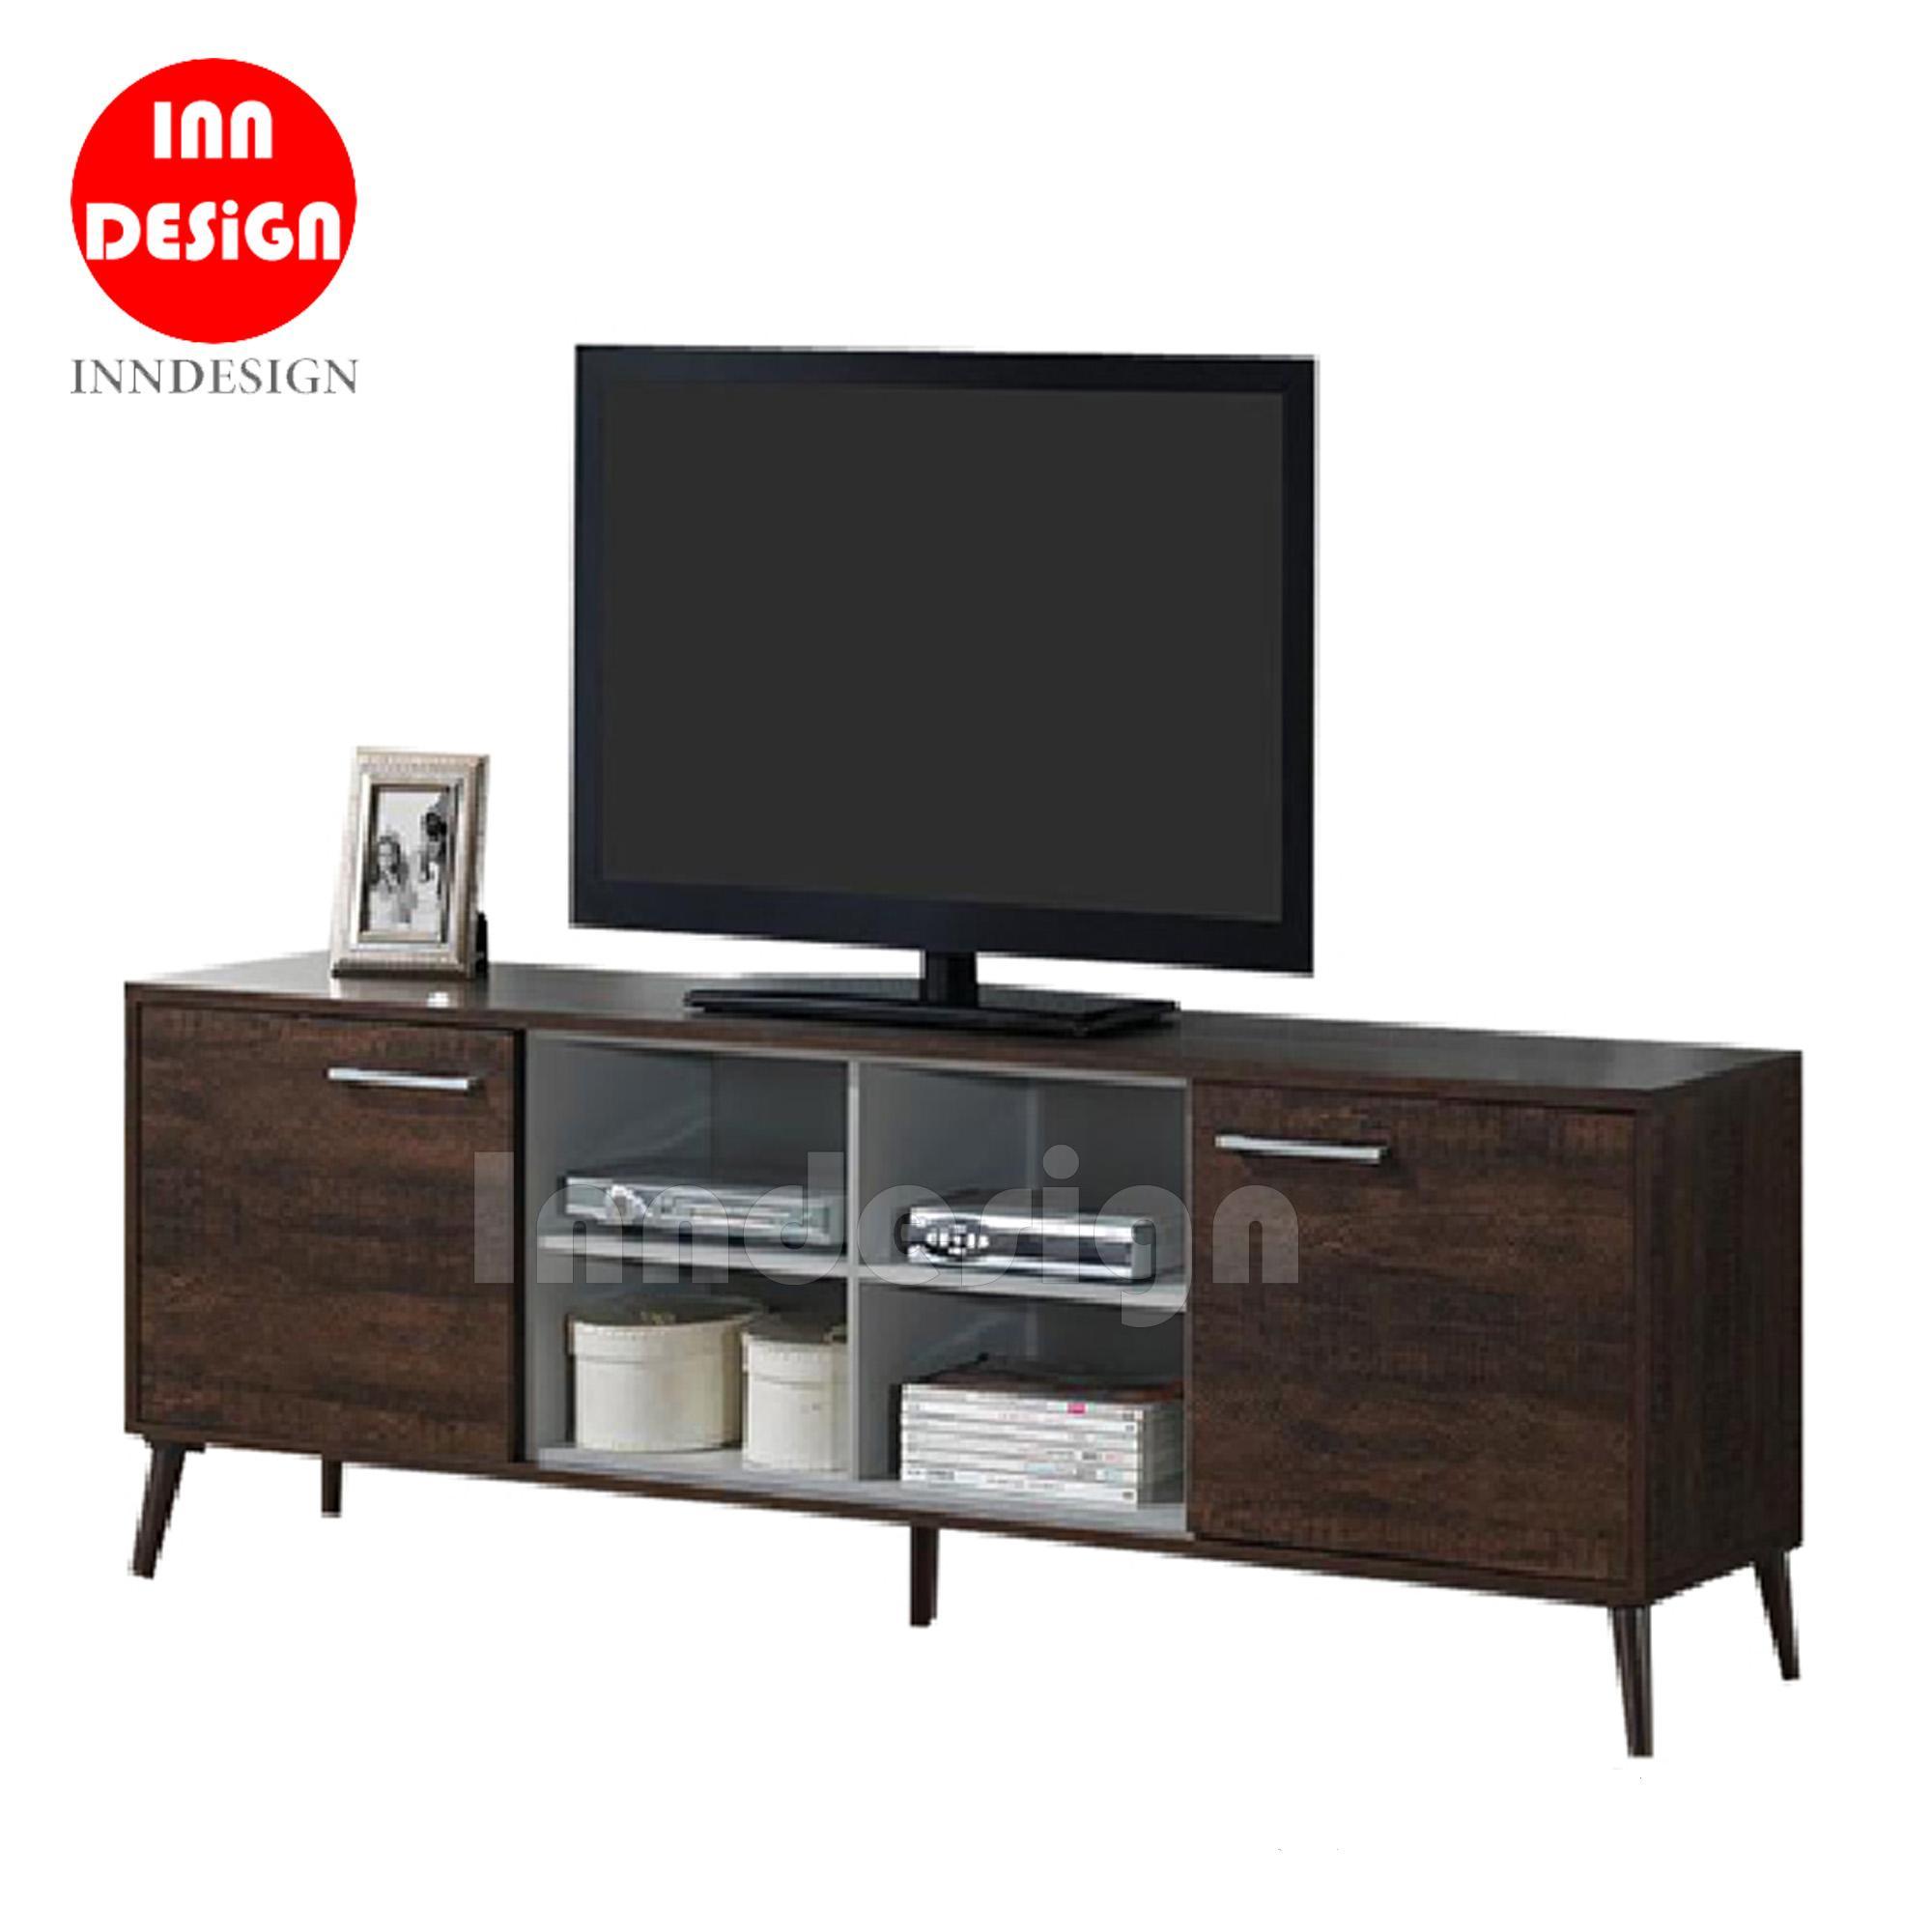 Edine 6ft TV Cabinet / TV Console